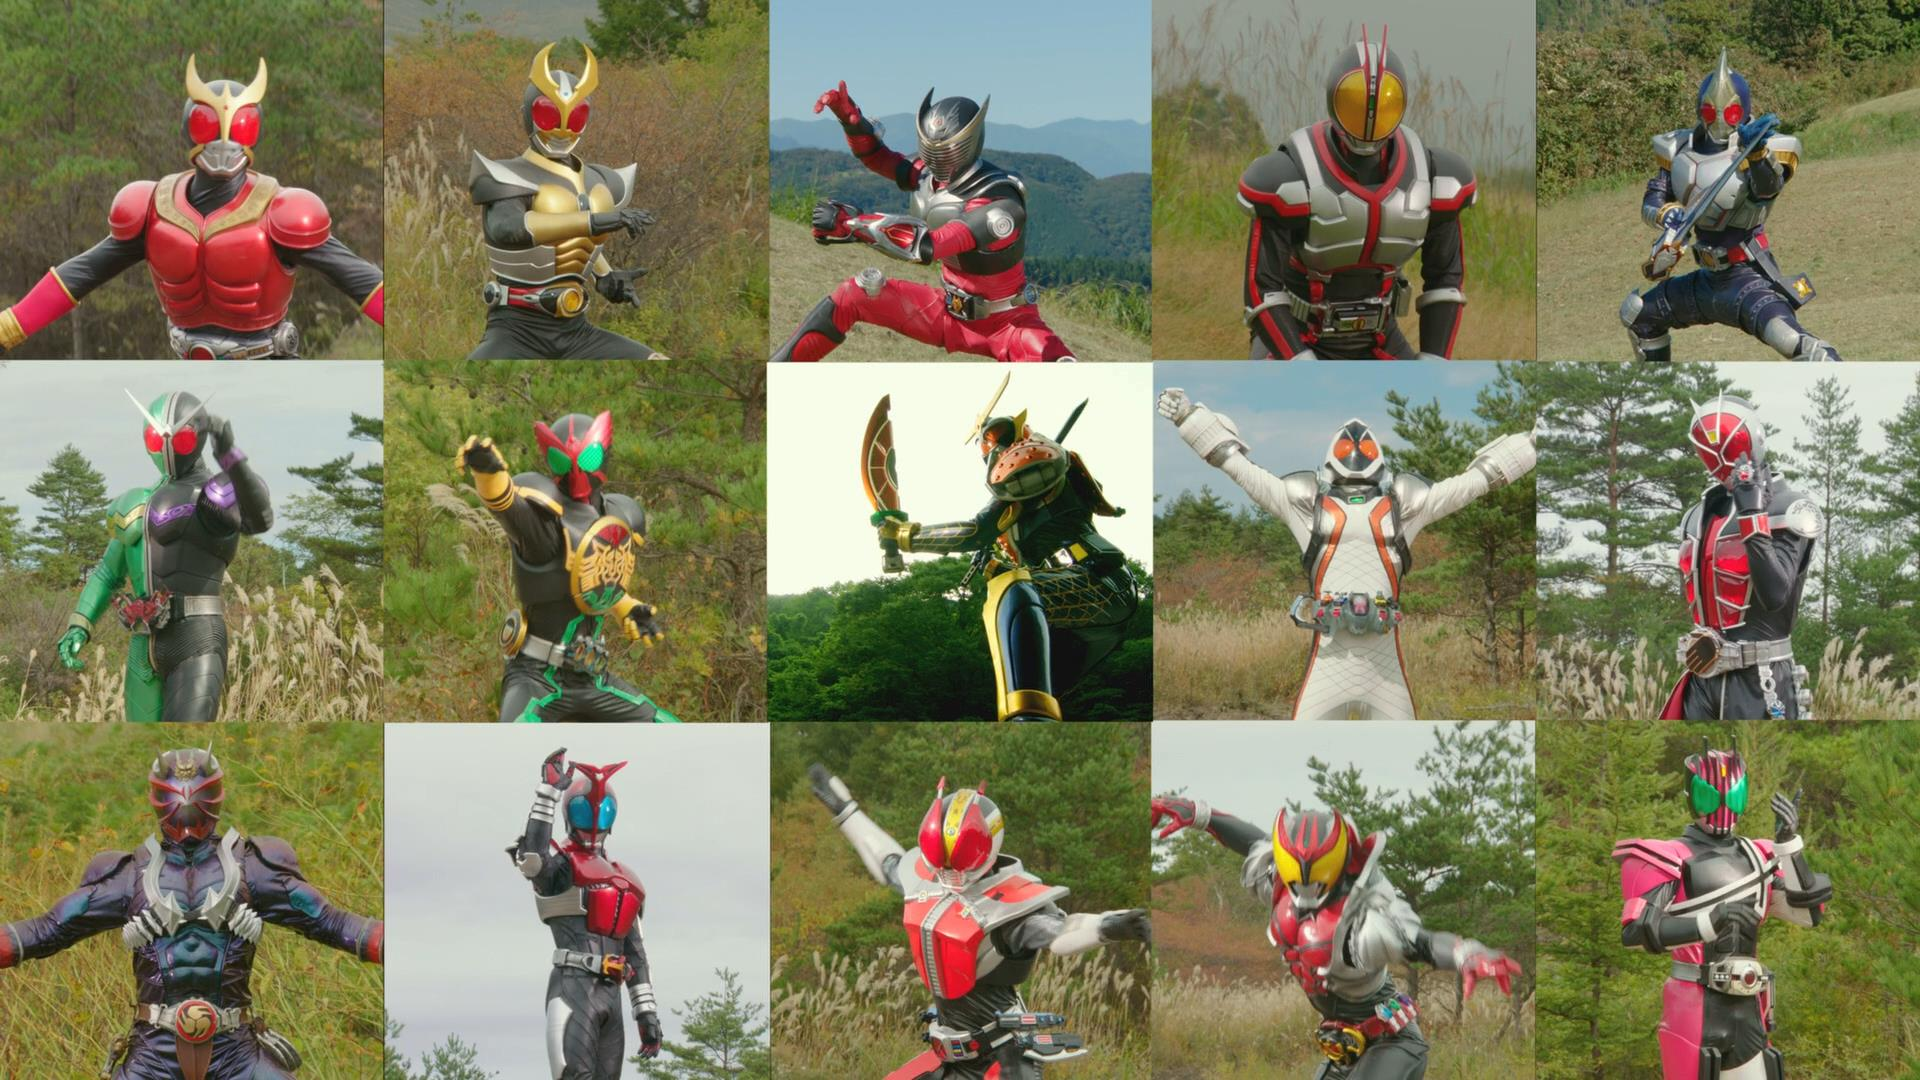 Heisei Kamen Rider 15th Anniversary